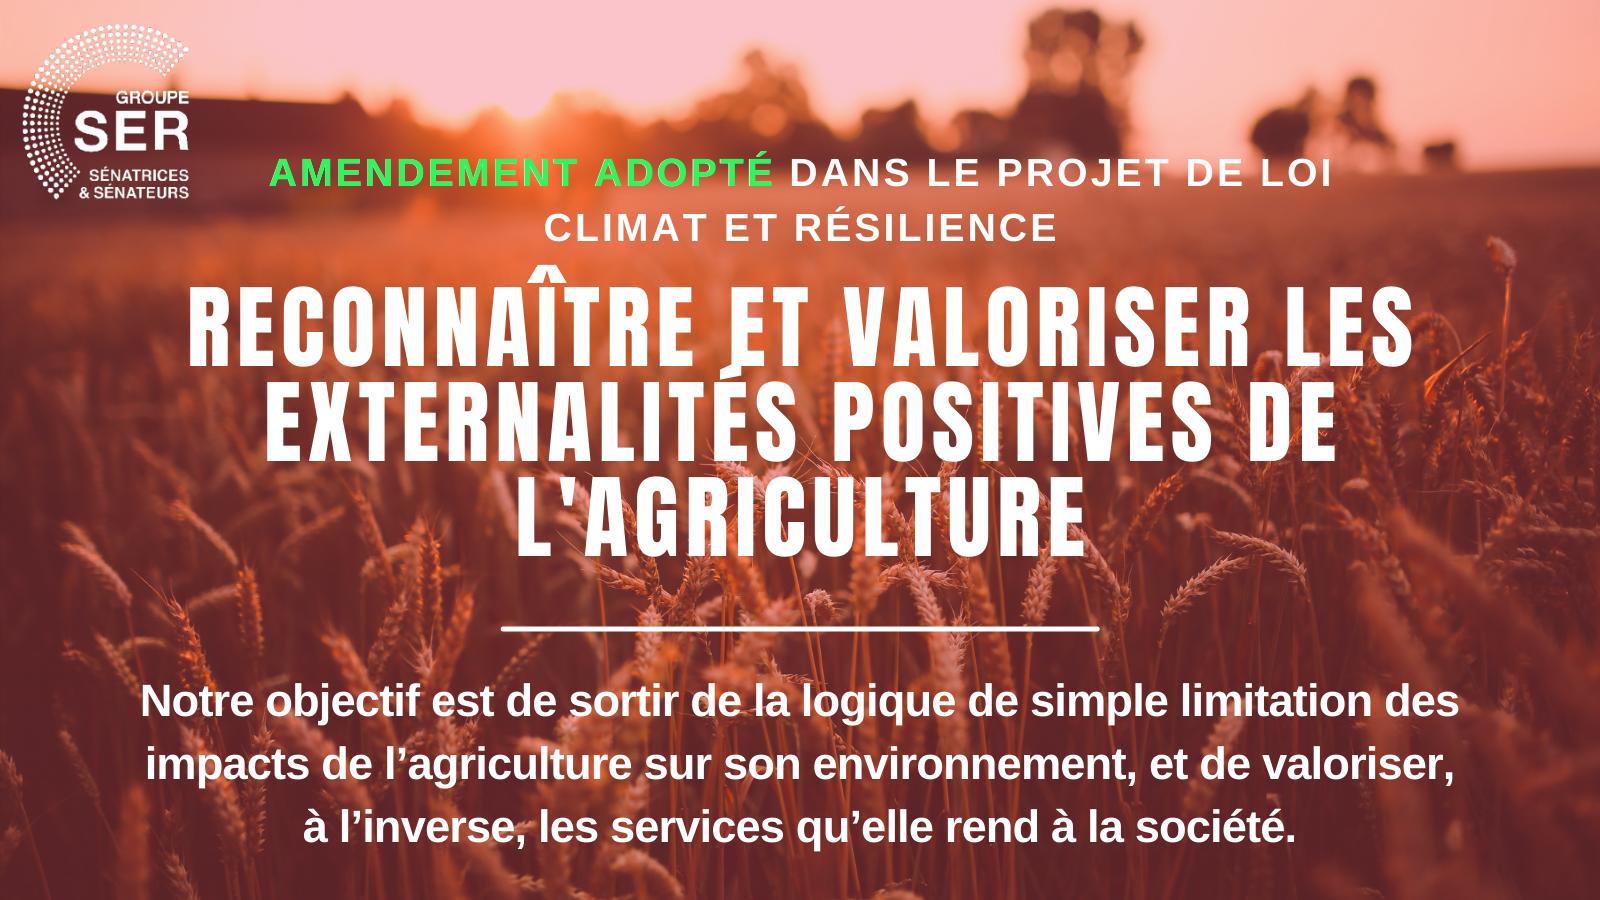 Externalités positives agriculture